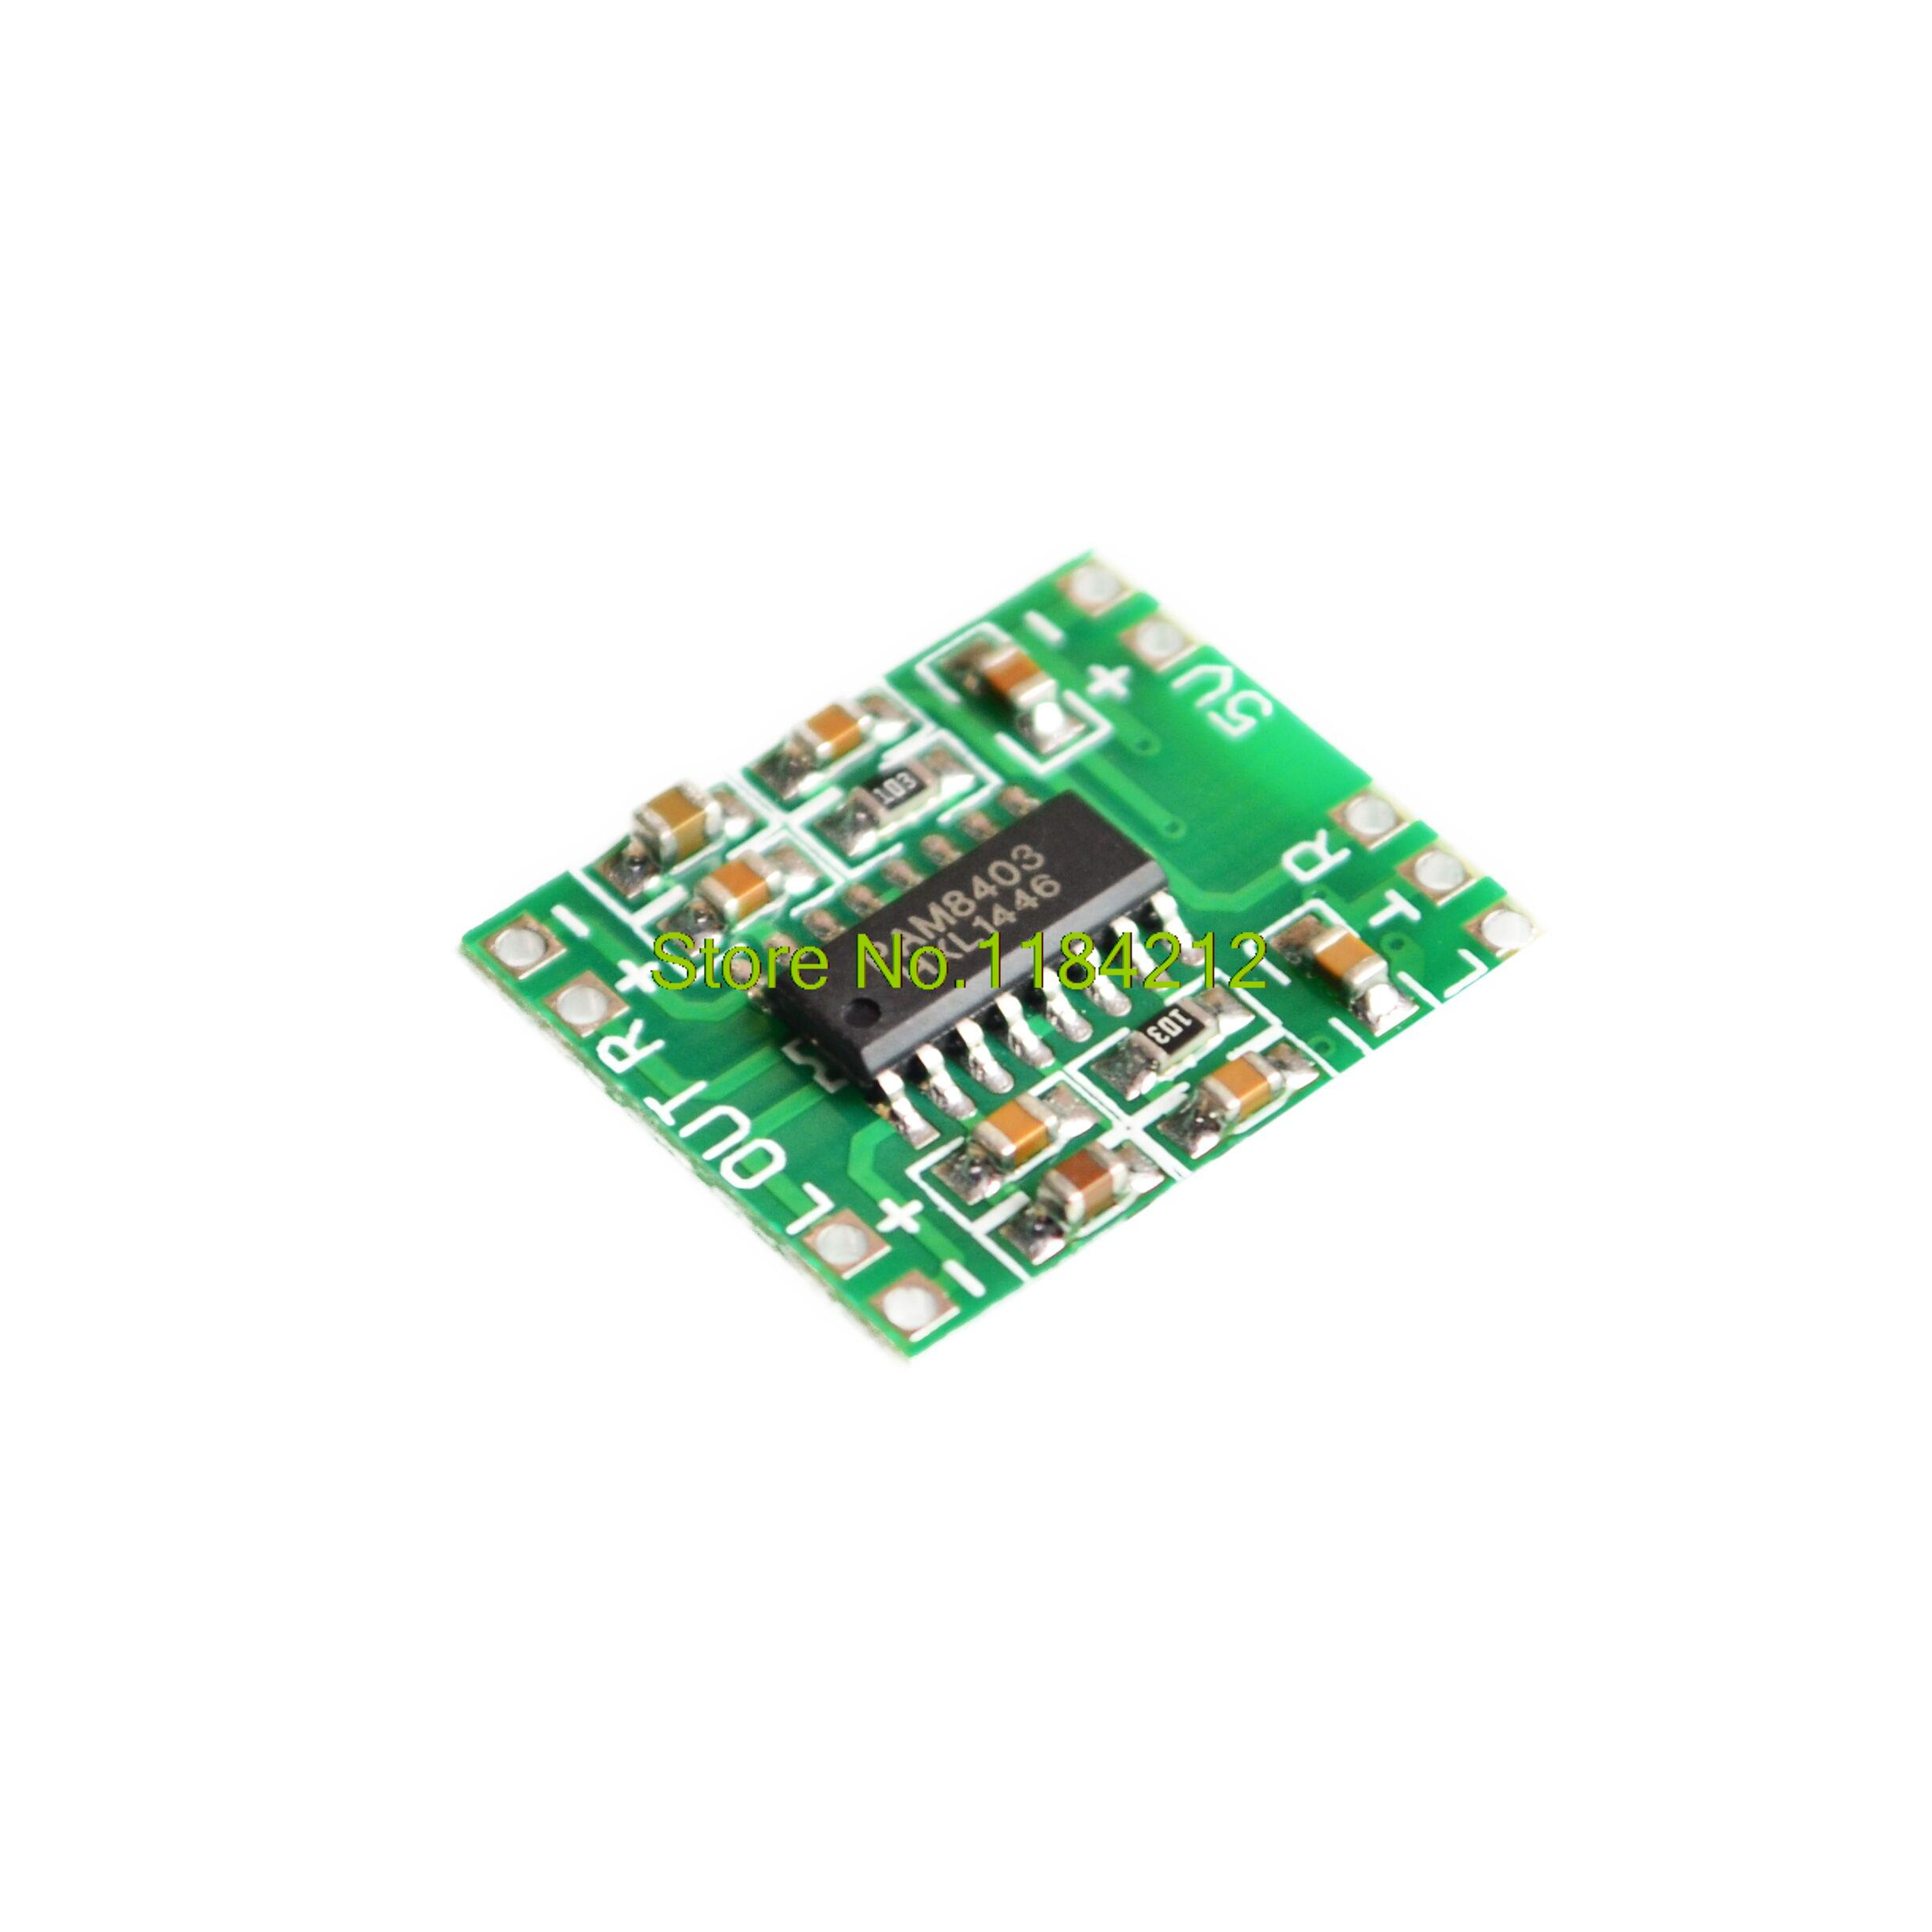 Demarkt PAM8403 Mini 5V Digitale Verst/ärkerplatine mit Schalter Potentiometer USB-Stromversorgung 2.5-5.5V